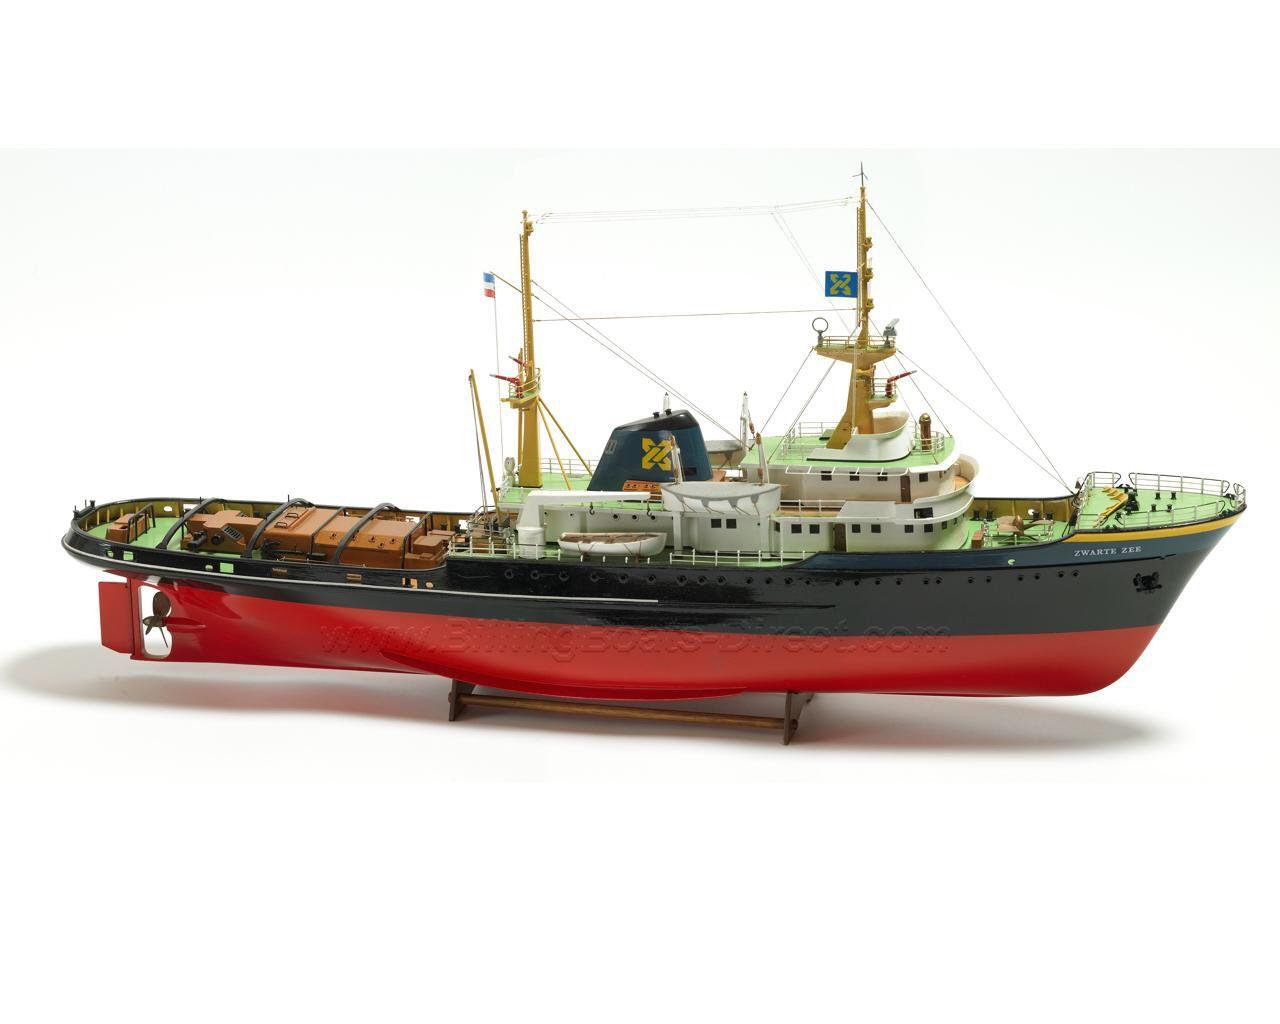 Billing Boats (B592) Zwarte Zee Tug - Model Boat & Fittings, Probably the Best Static and Radio ...